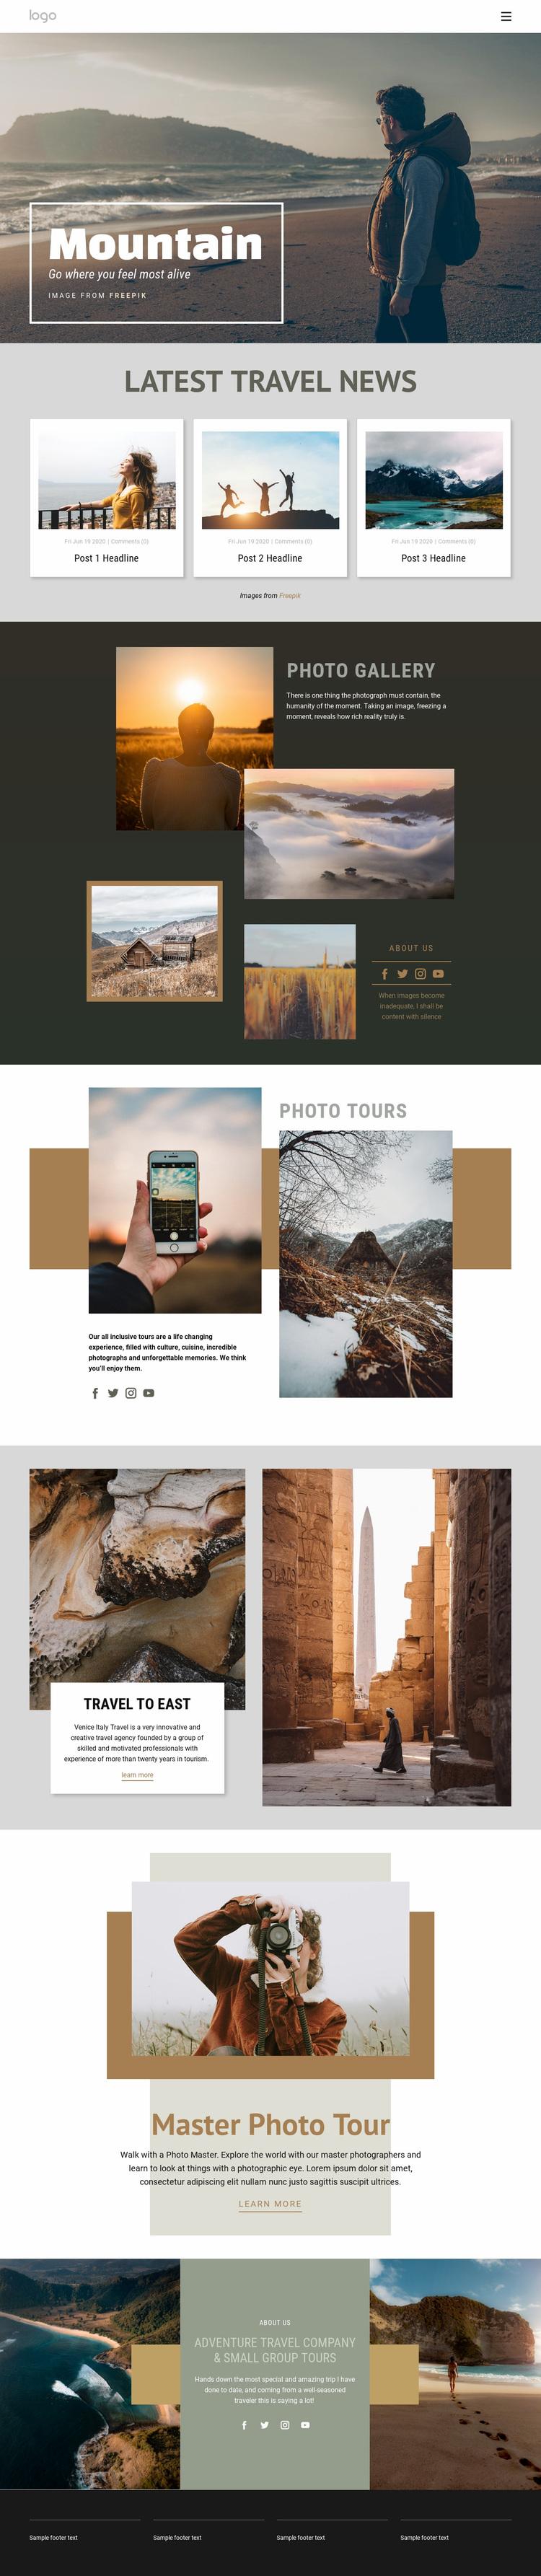 Mountain advanture travel Web Page Designer